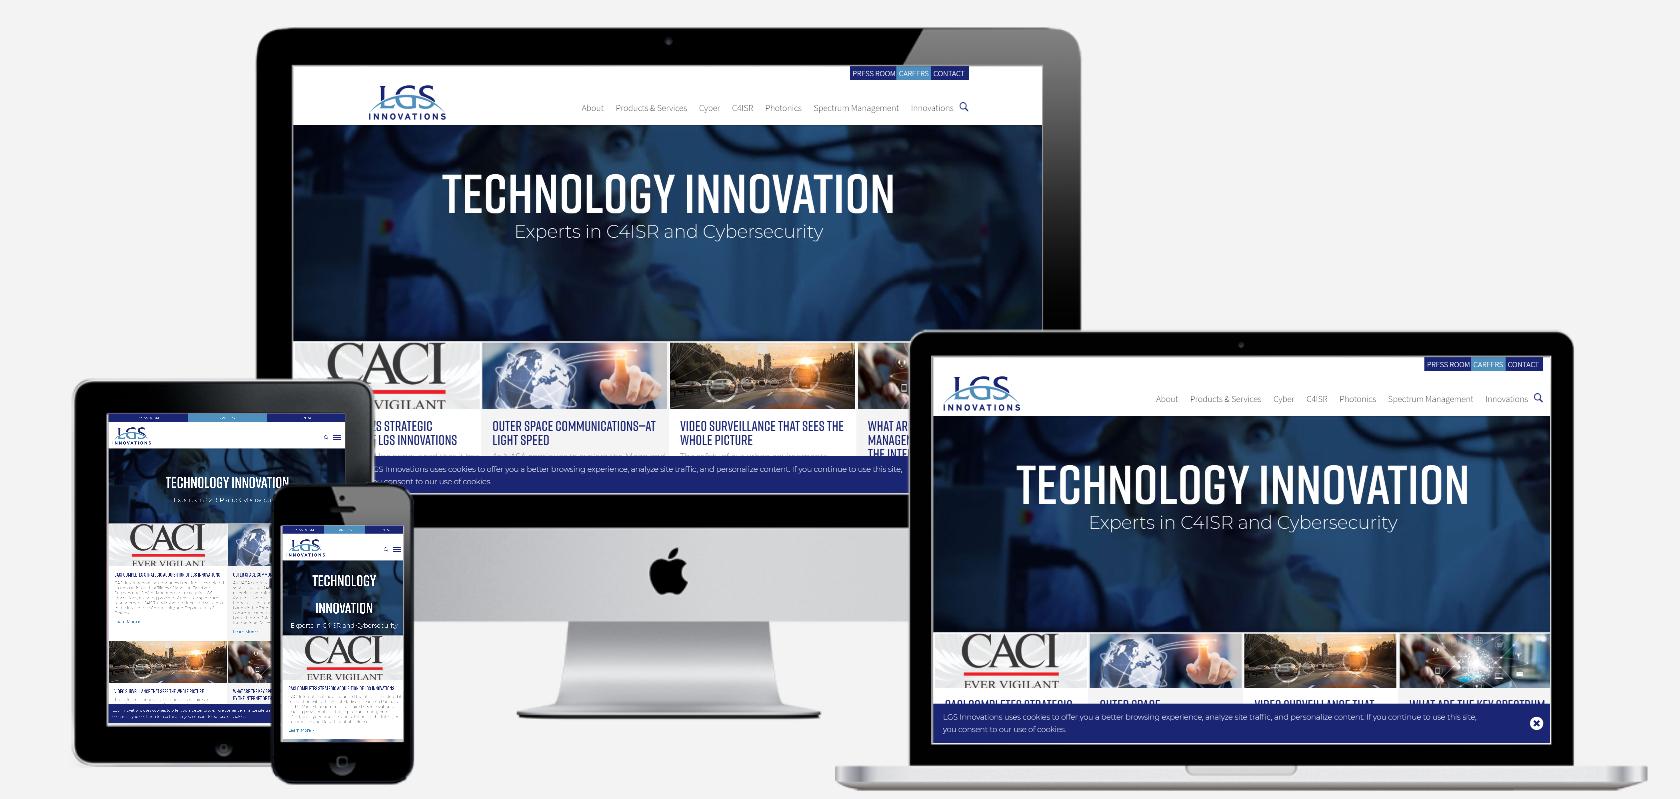 Wordpress Web Design Services Michigan Website Design Services Professional Website Design Website Design